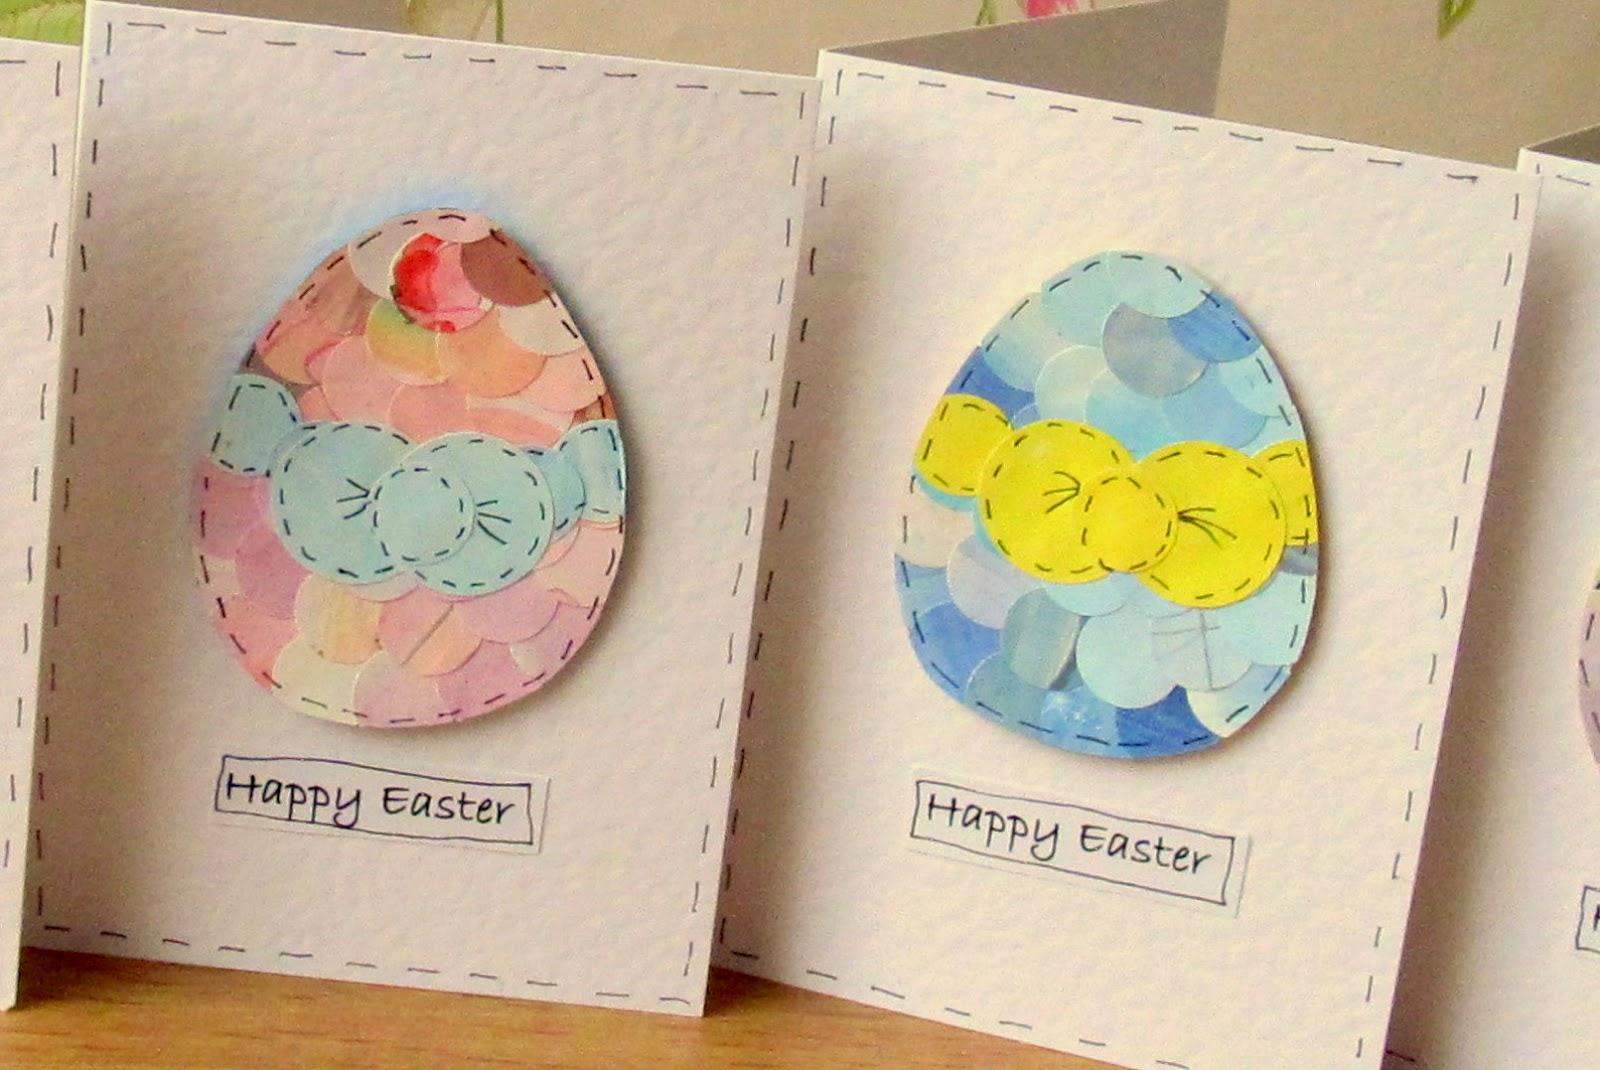 Jennuine by Rook No 17 DIY Vintage Paper Easter Egg Art Guest – Homemade Easter Cards